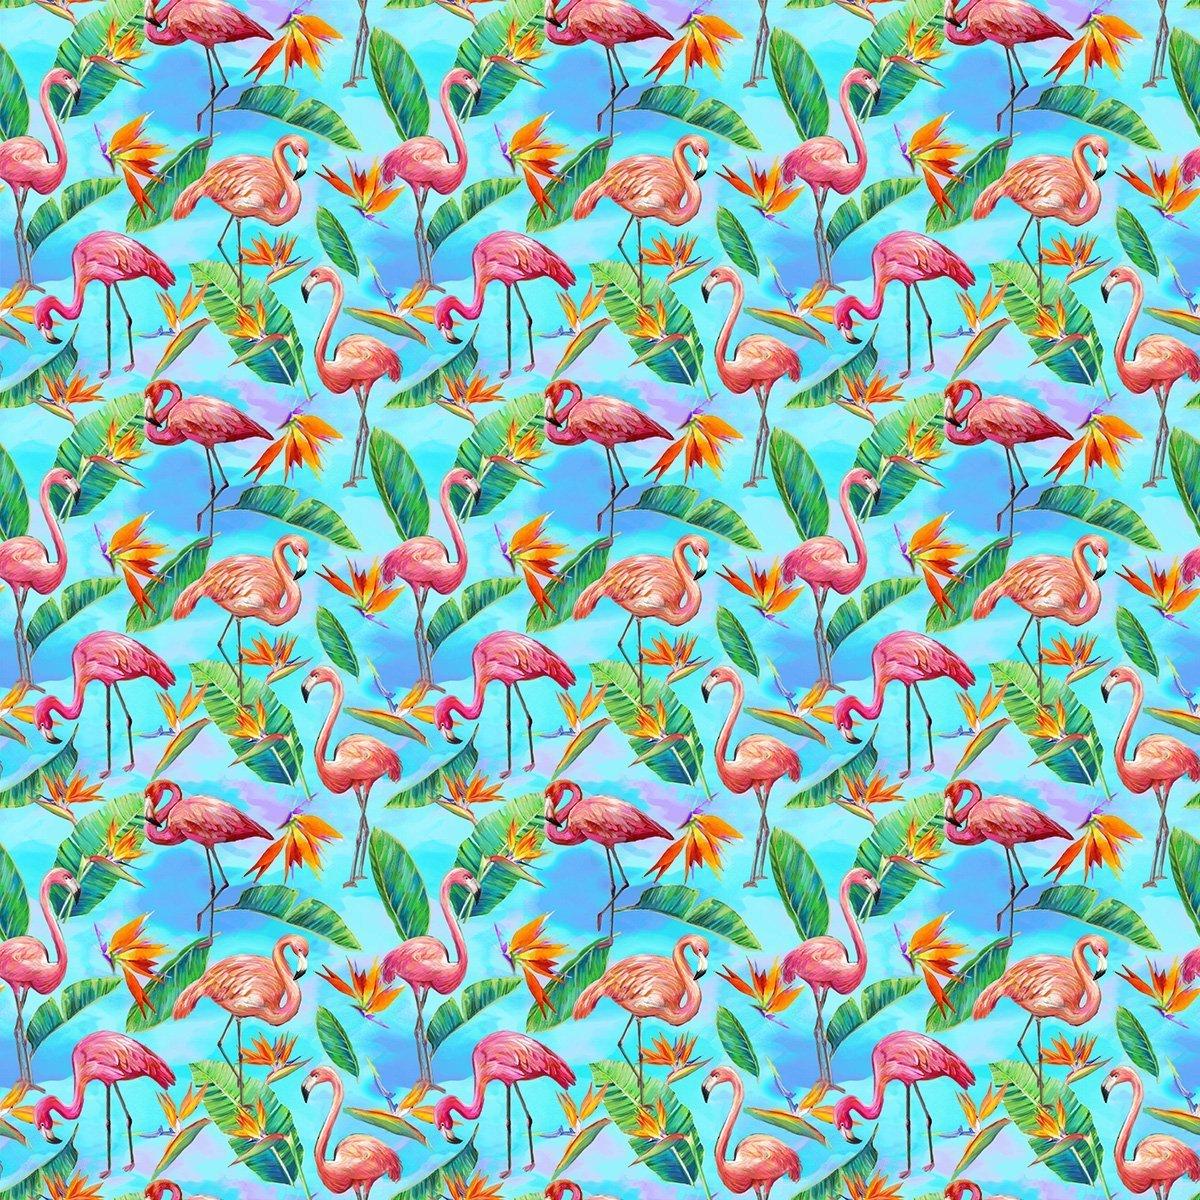 Flamingo Small Allover